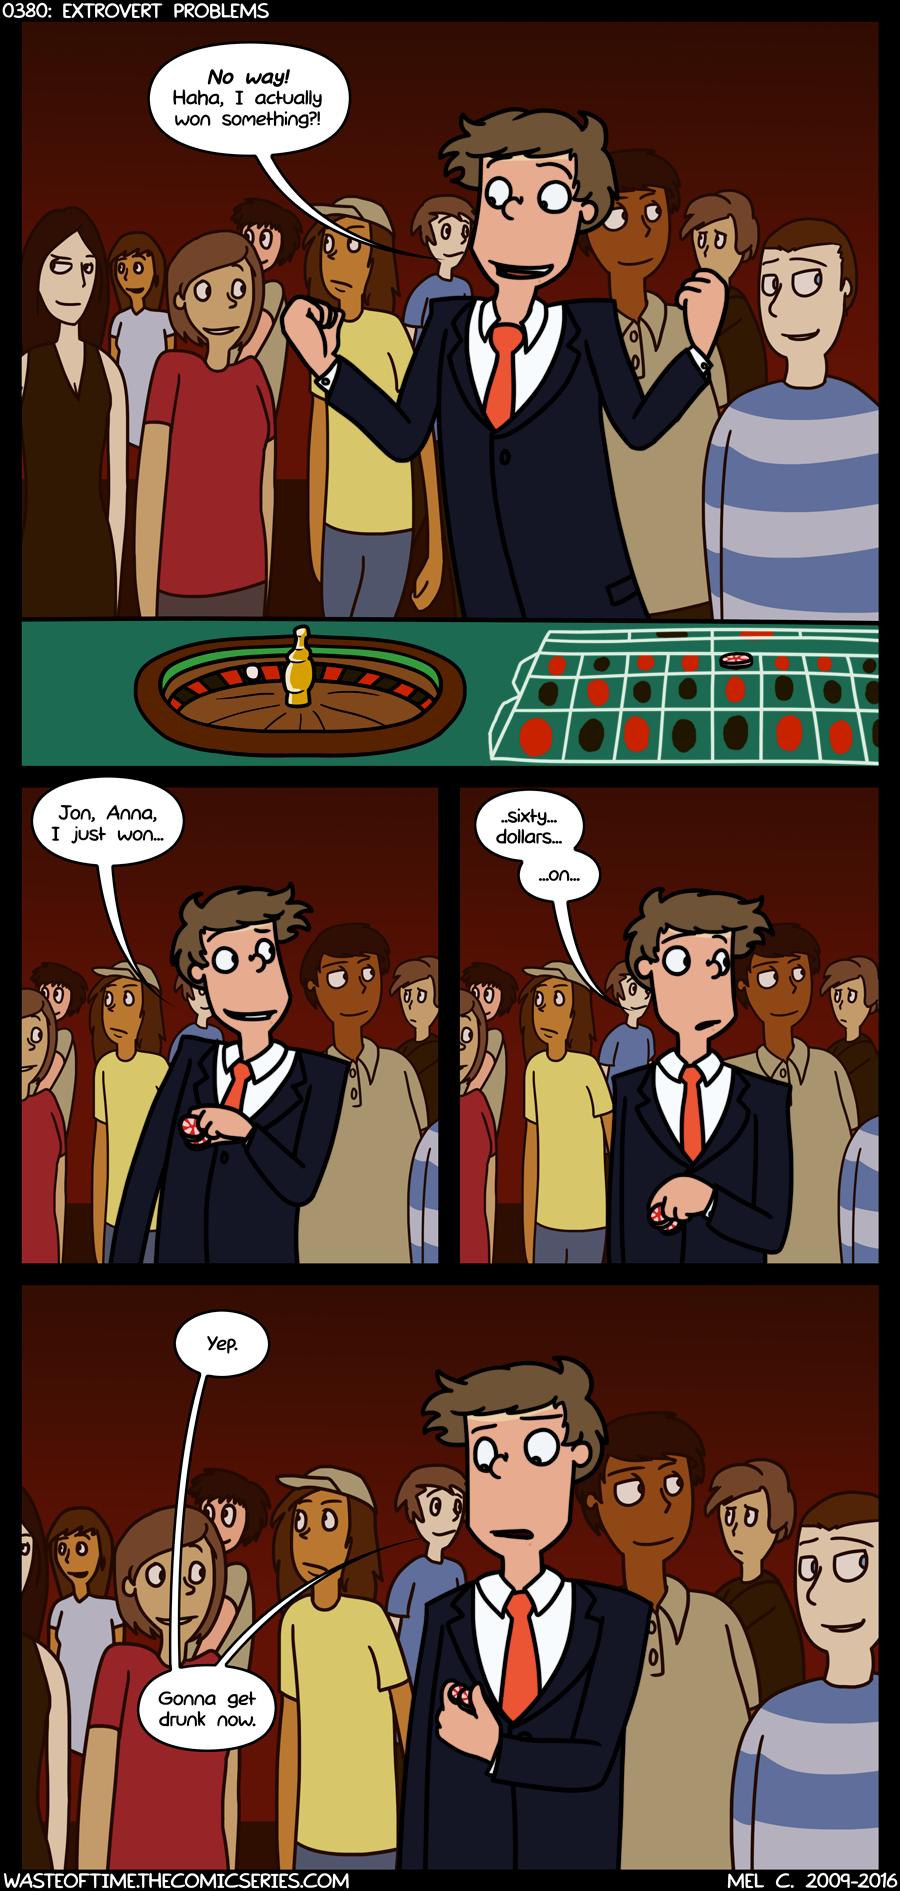 0380: Extrovert Problems